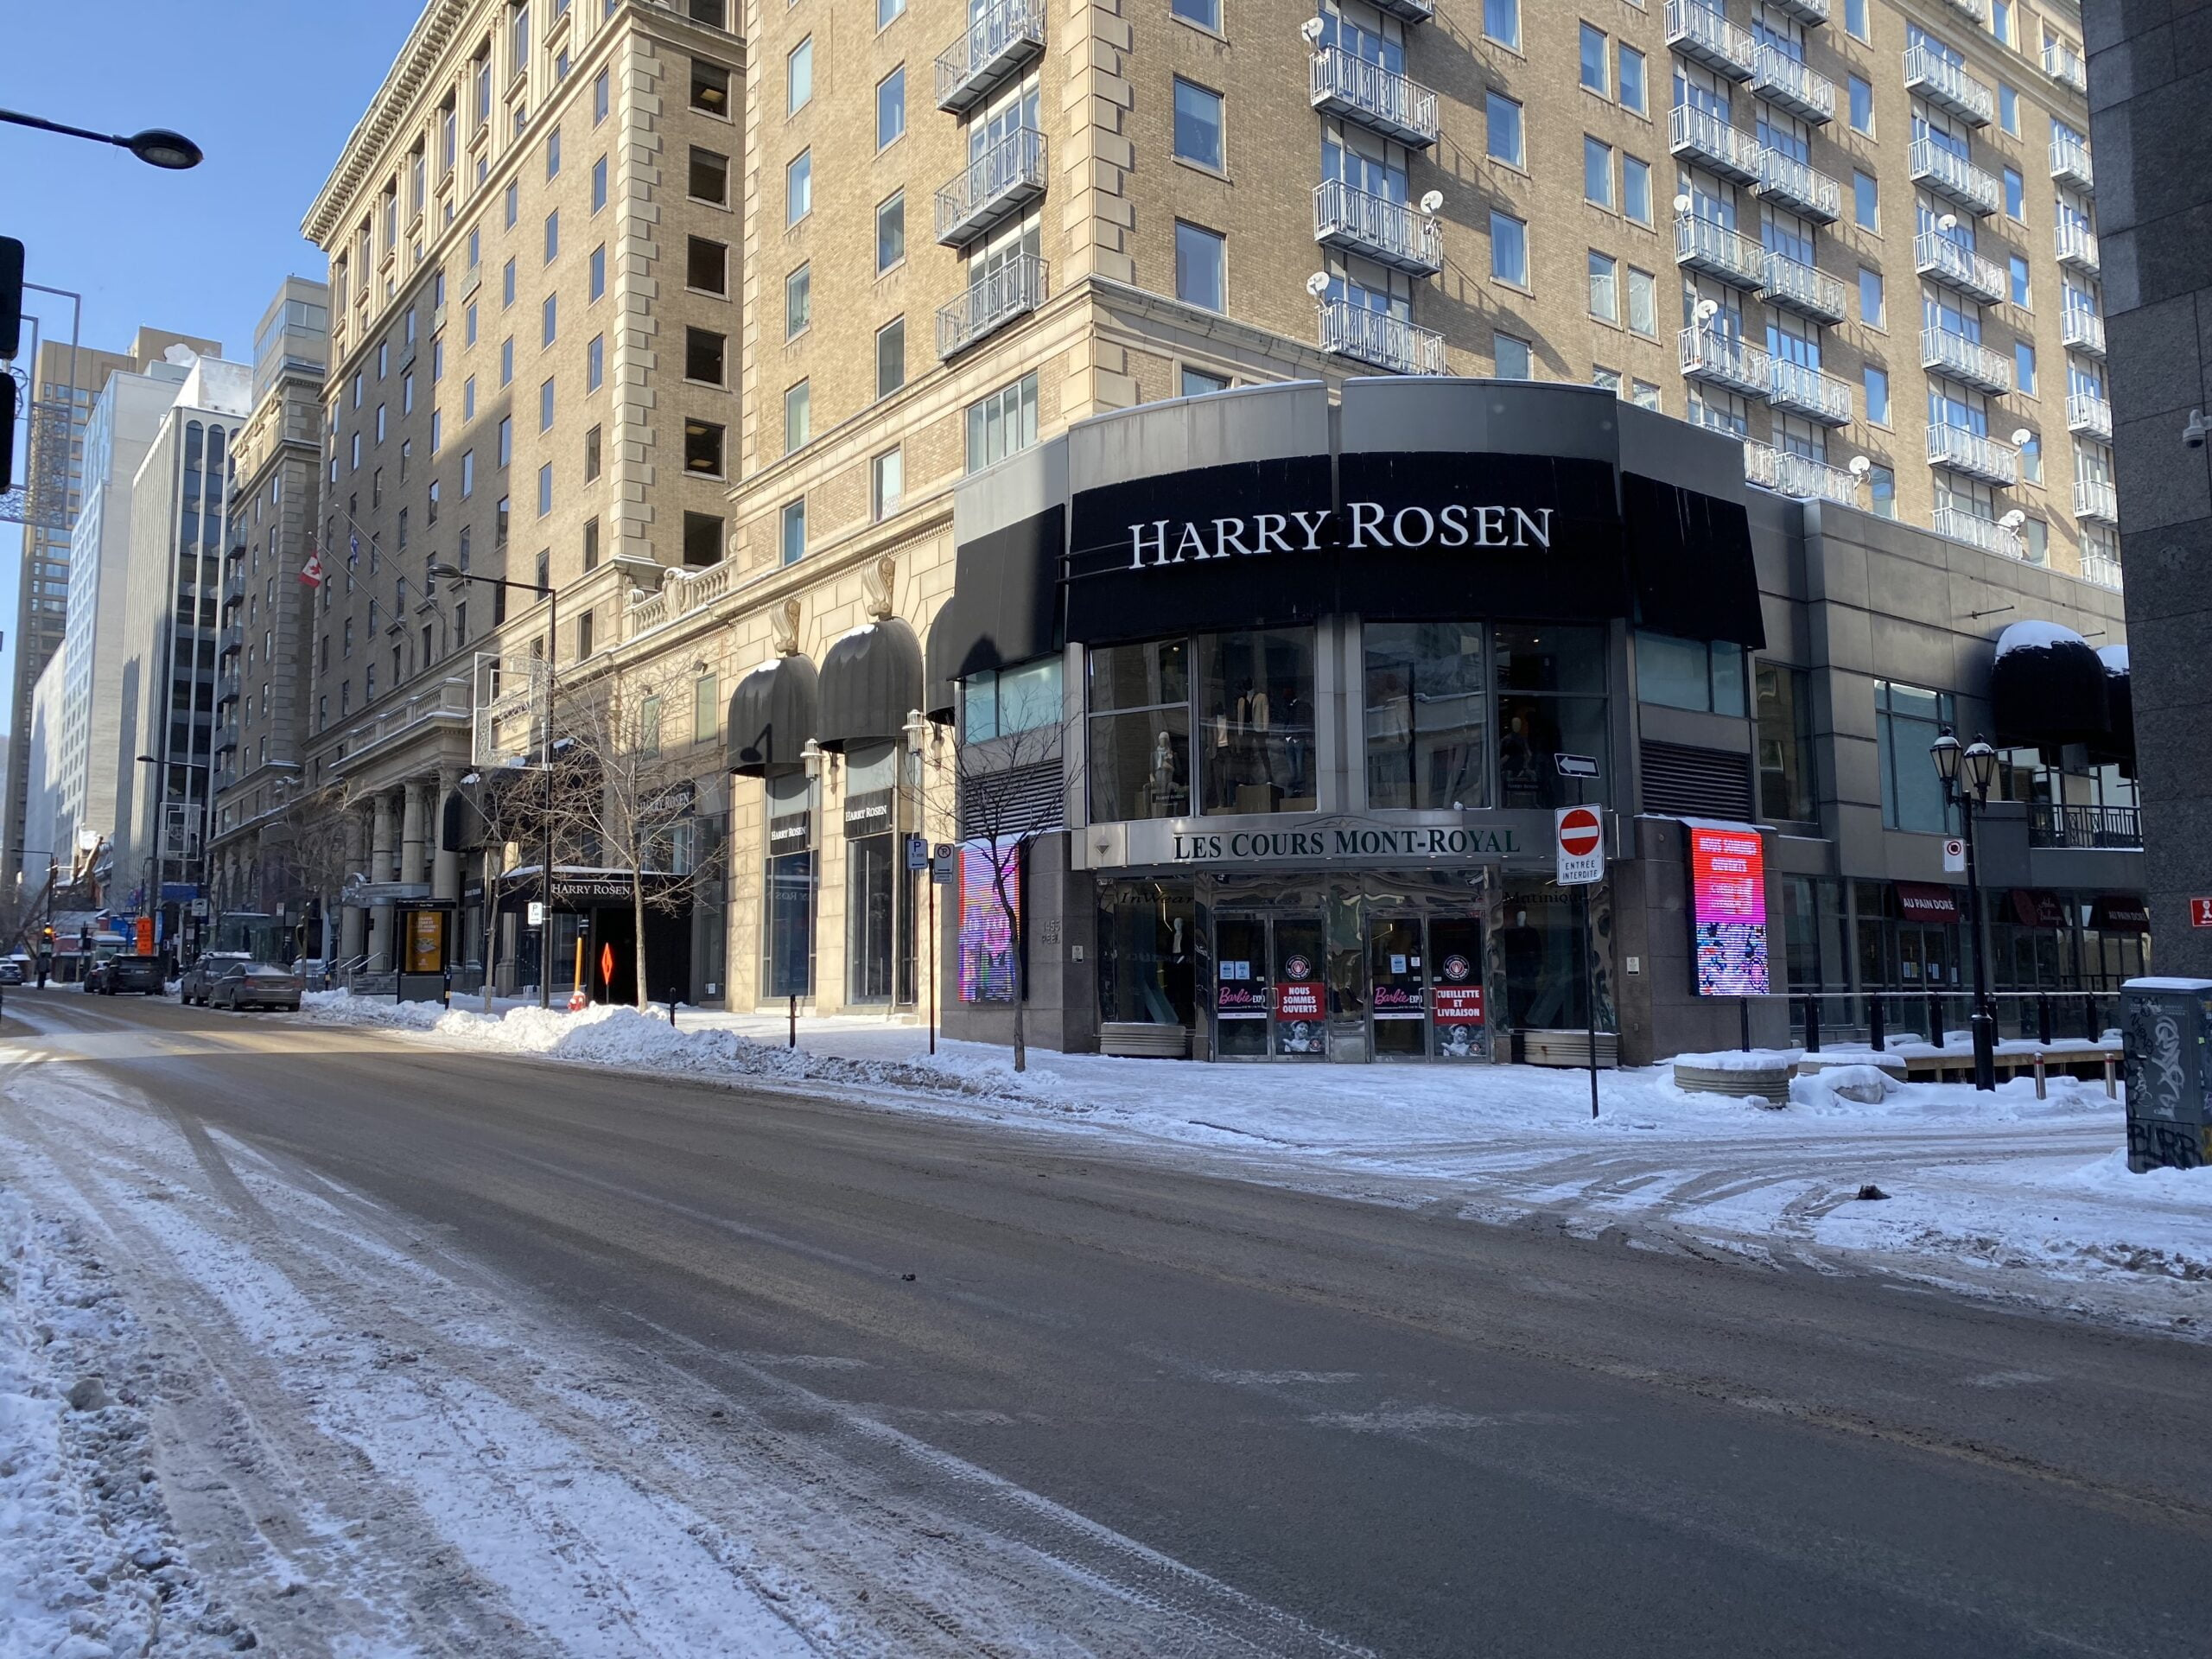 Harry Rosen (1455 Peel St, Montreal, Quebec)